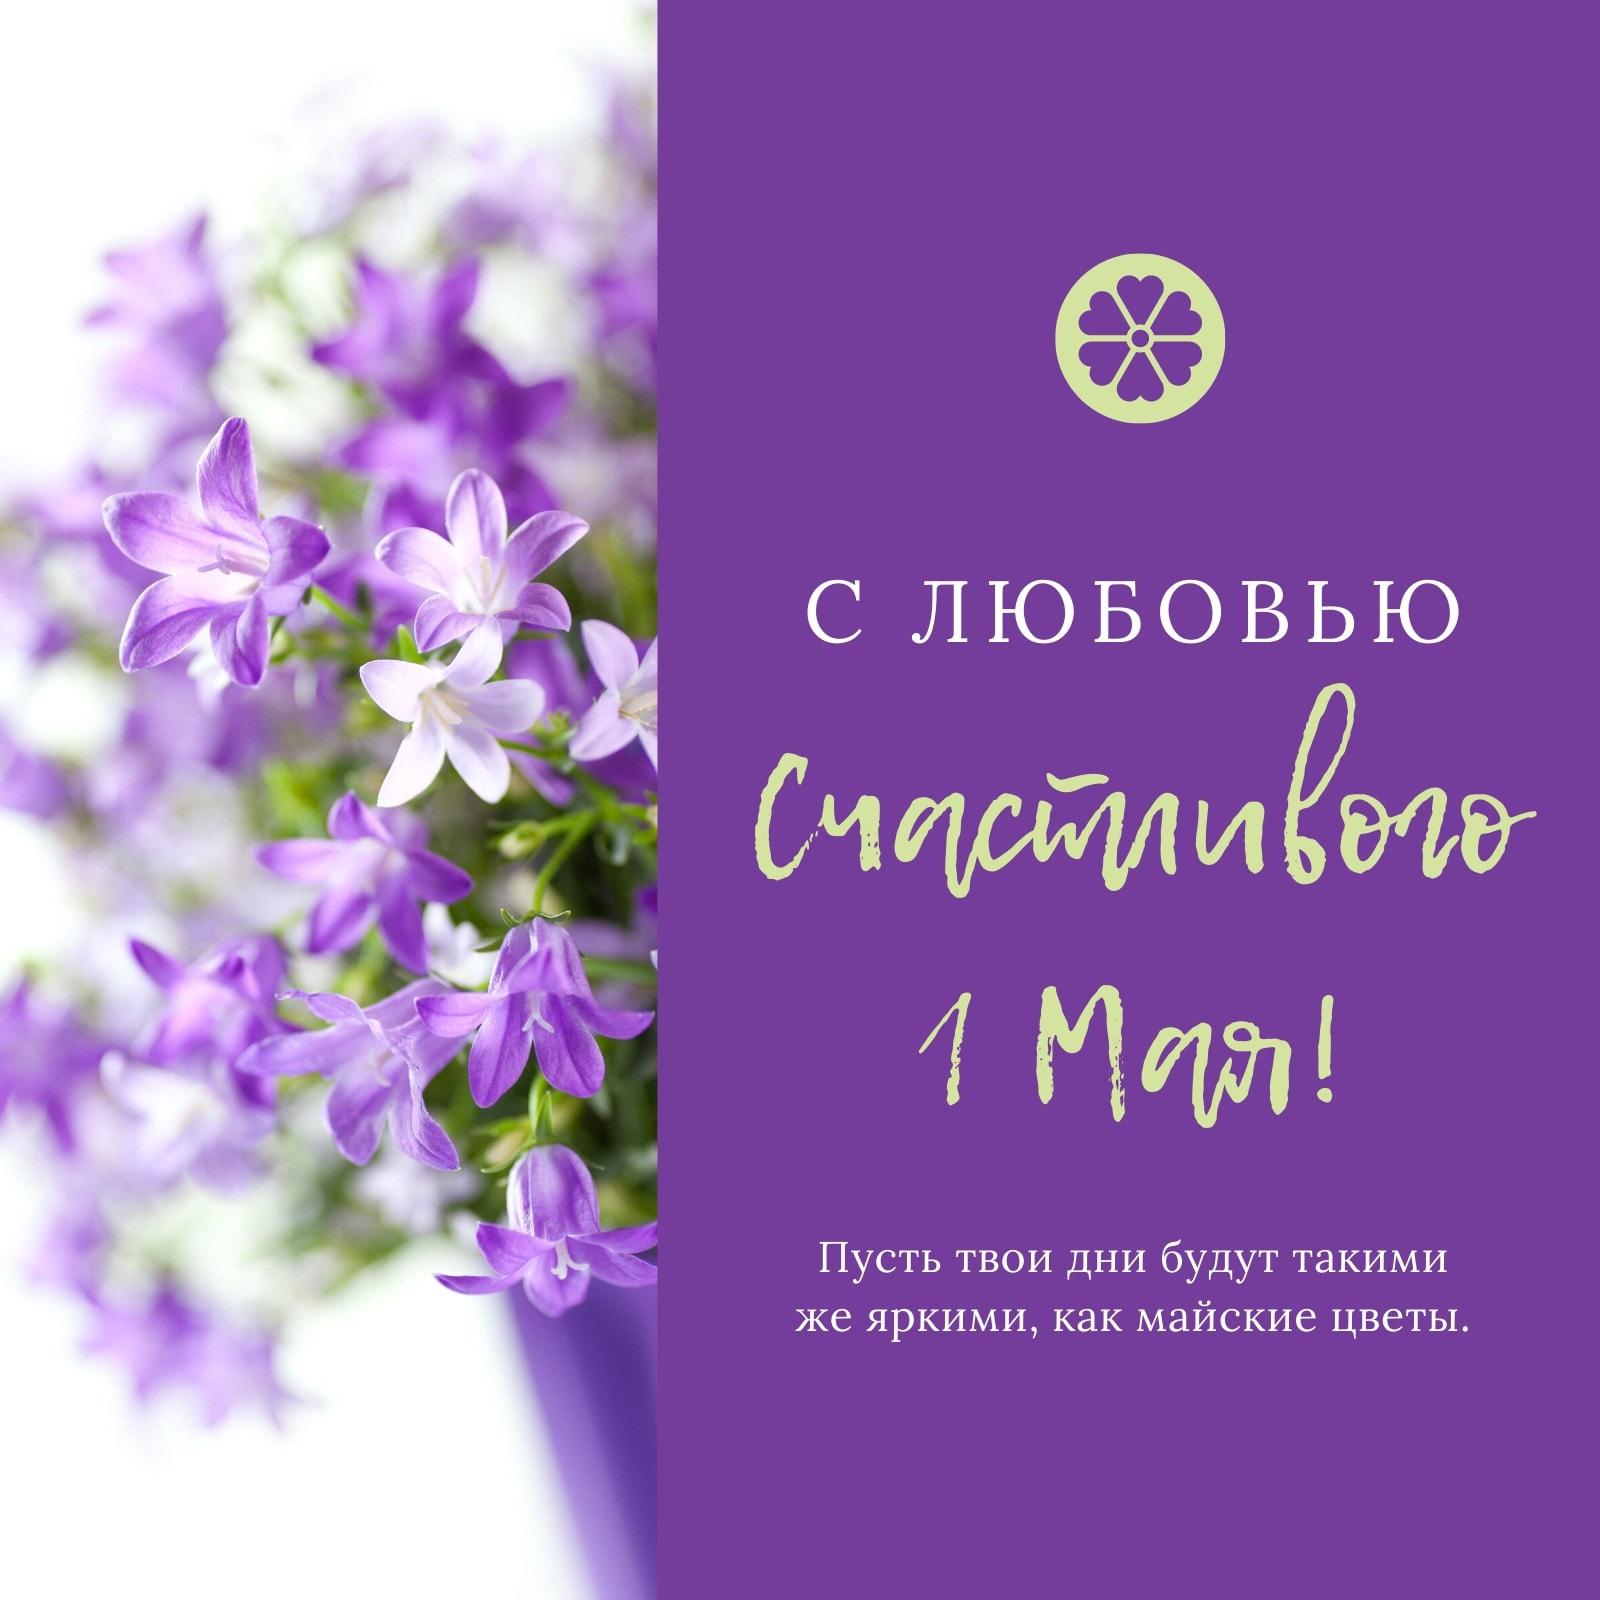 Фиолетовая Цветок 1 Мая Instagram Публикация